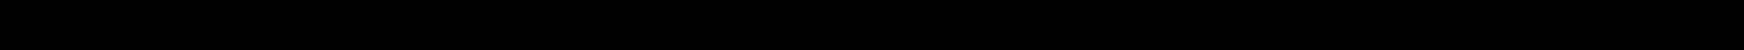 cf_semplice_pro_bd-webfont.ttf